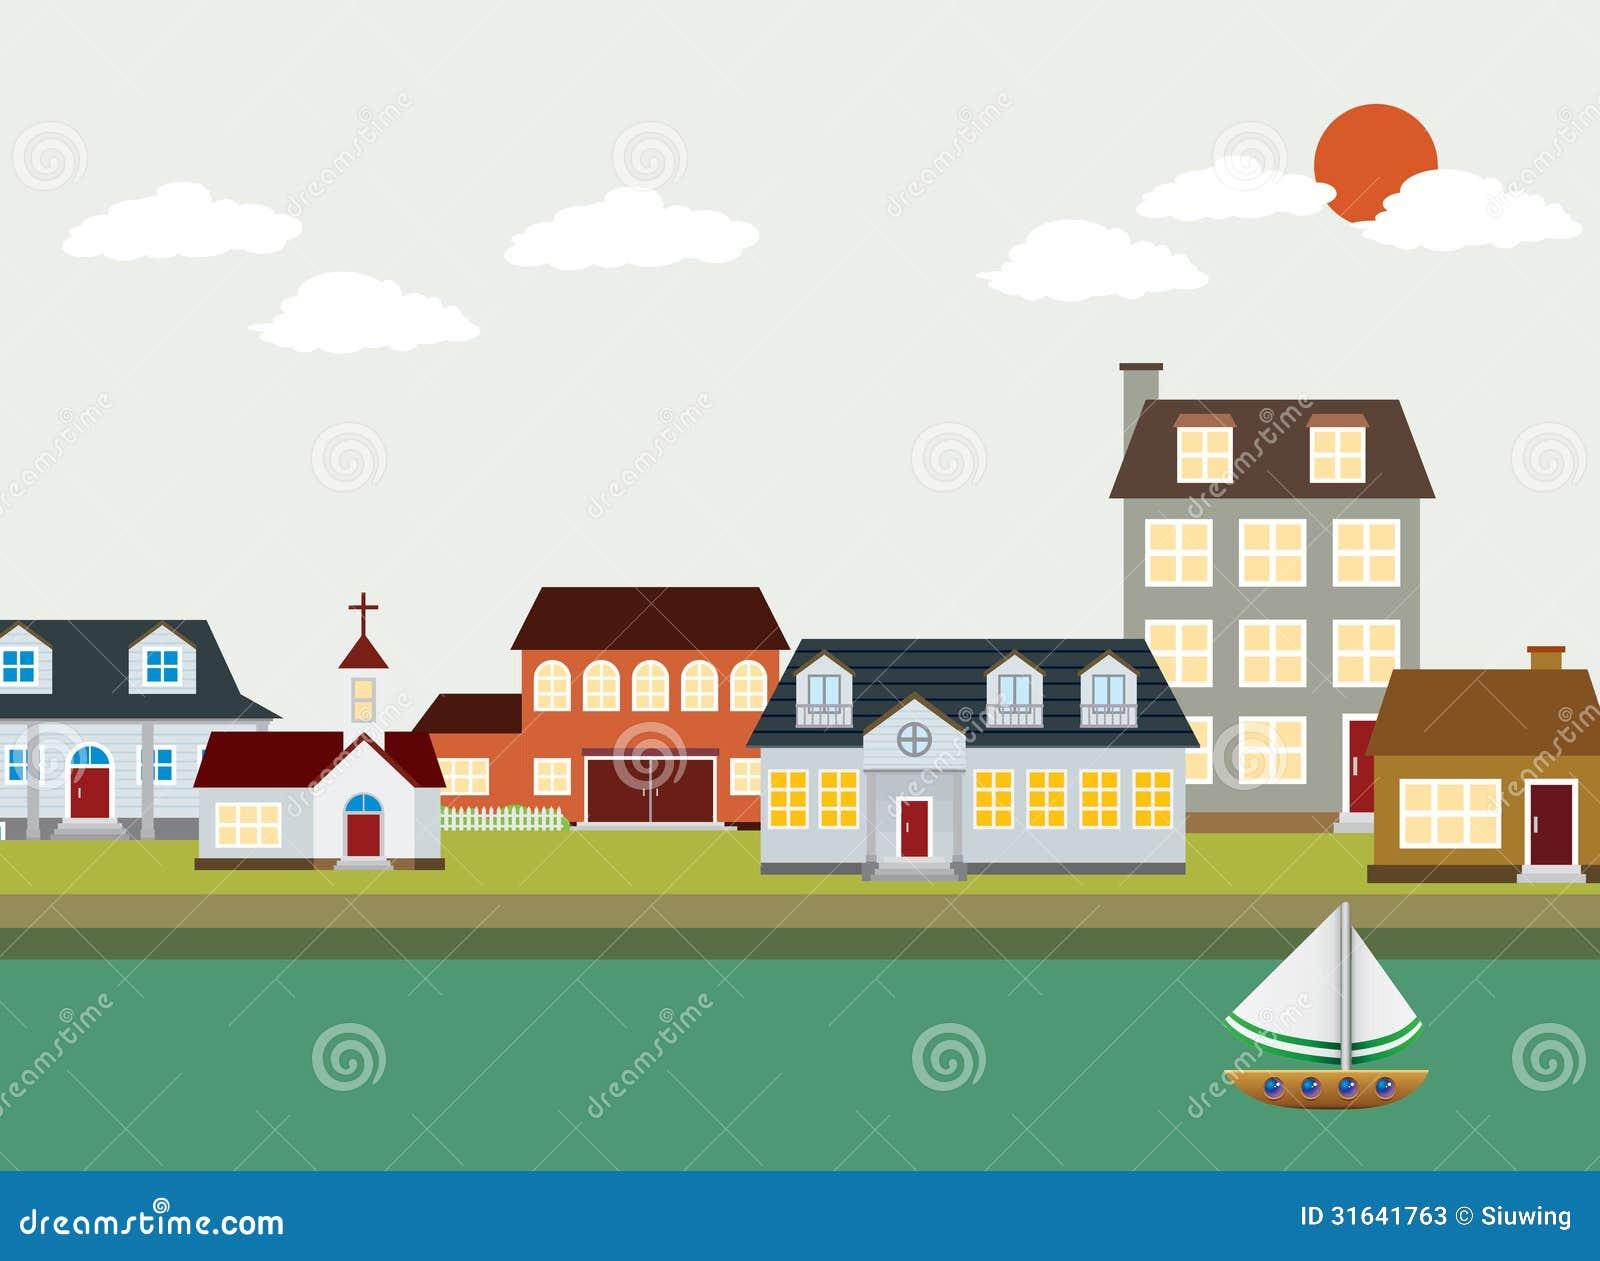 Town Landscape Vector Illustration